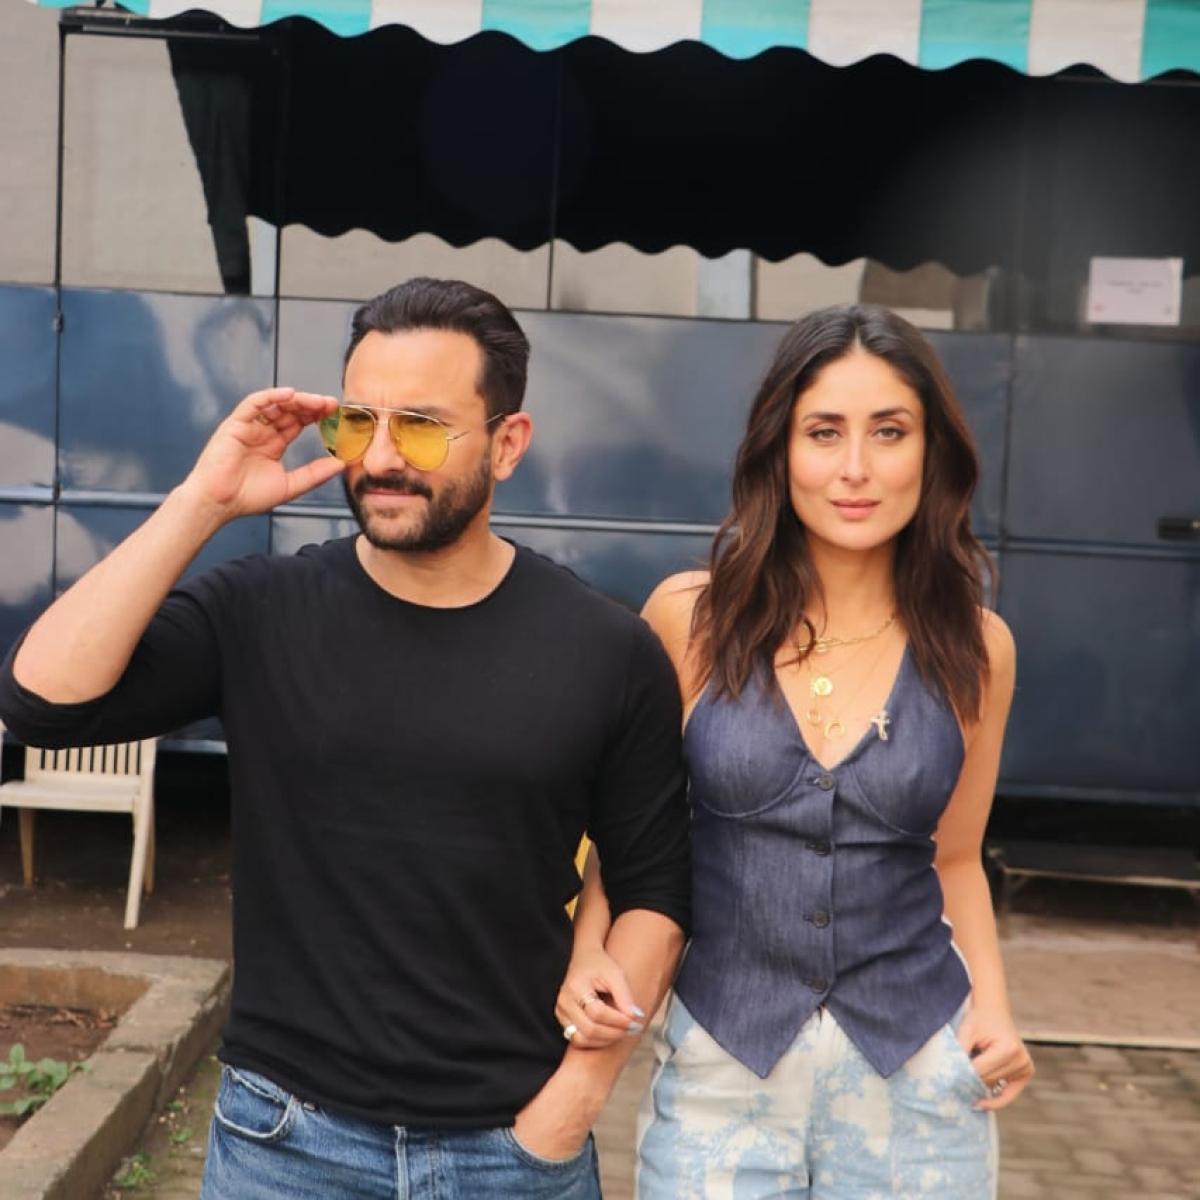 Kareena Kapoor Instagrams as hubby Saif Ali Khan is 'booked' amid social distancing